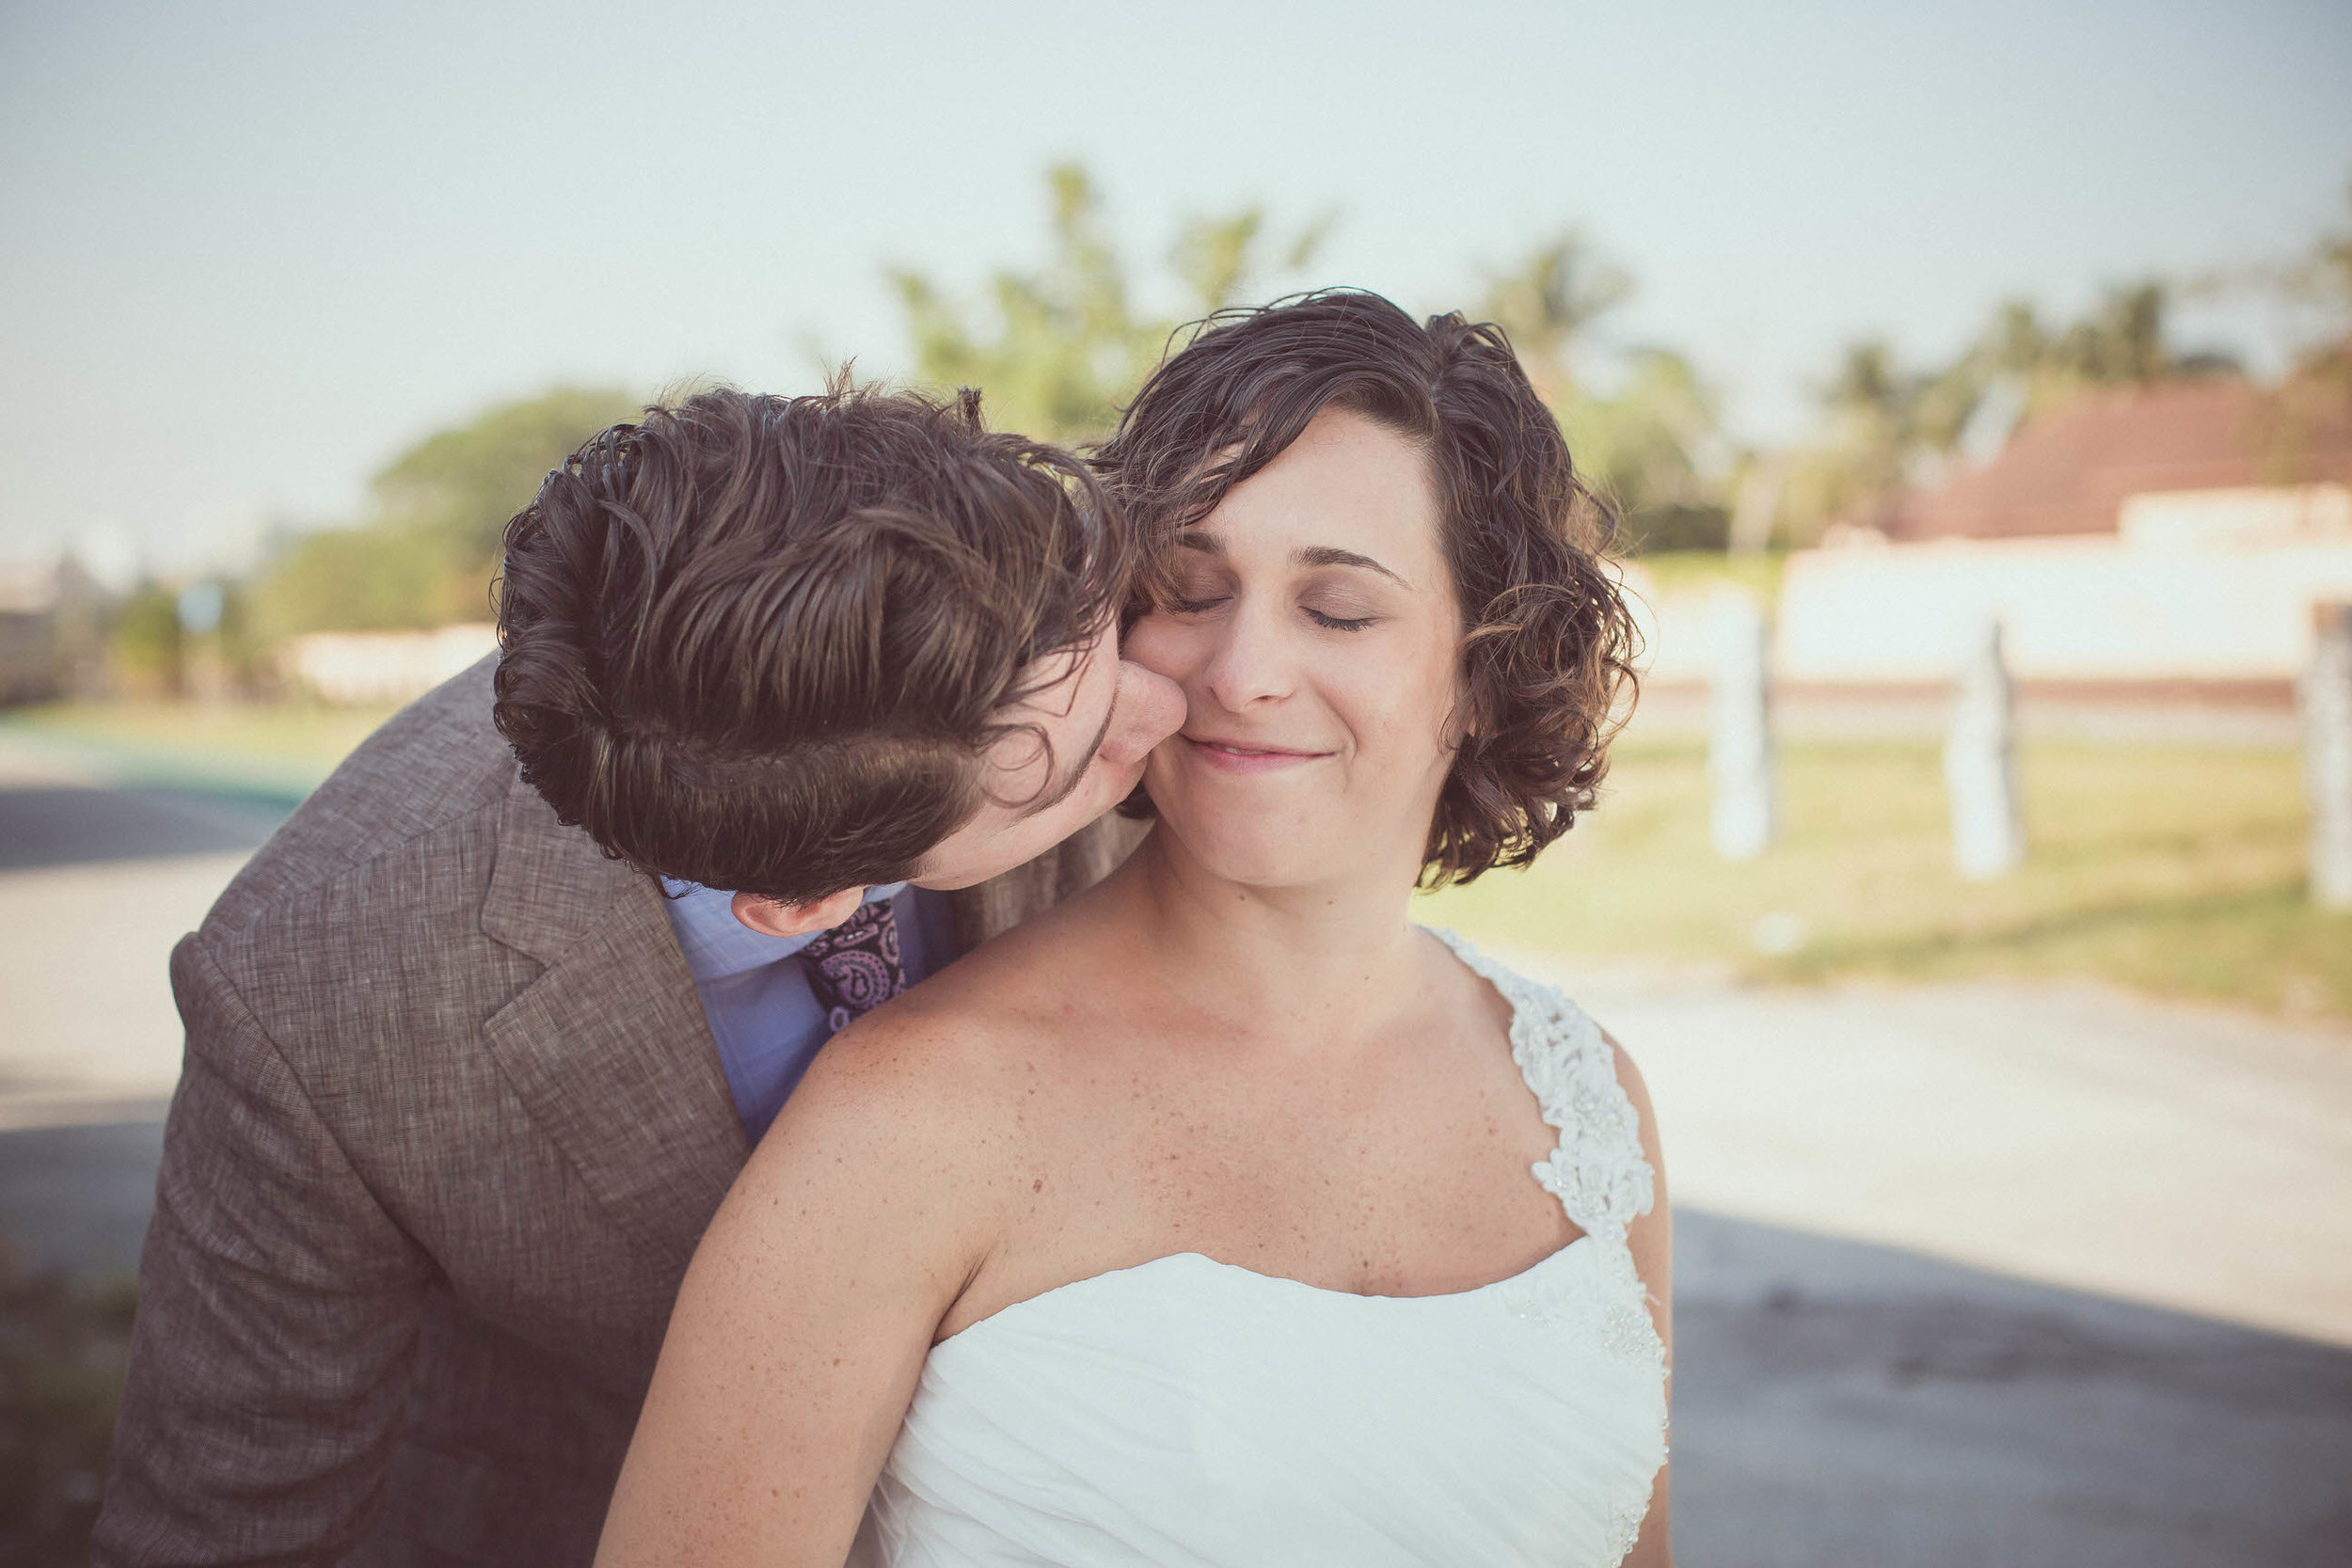 bride-groom-first-look-fort-lauderdale-wedding-tiny-house-photo.jpg